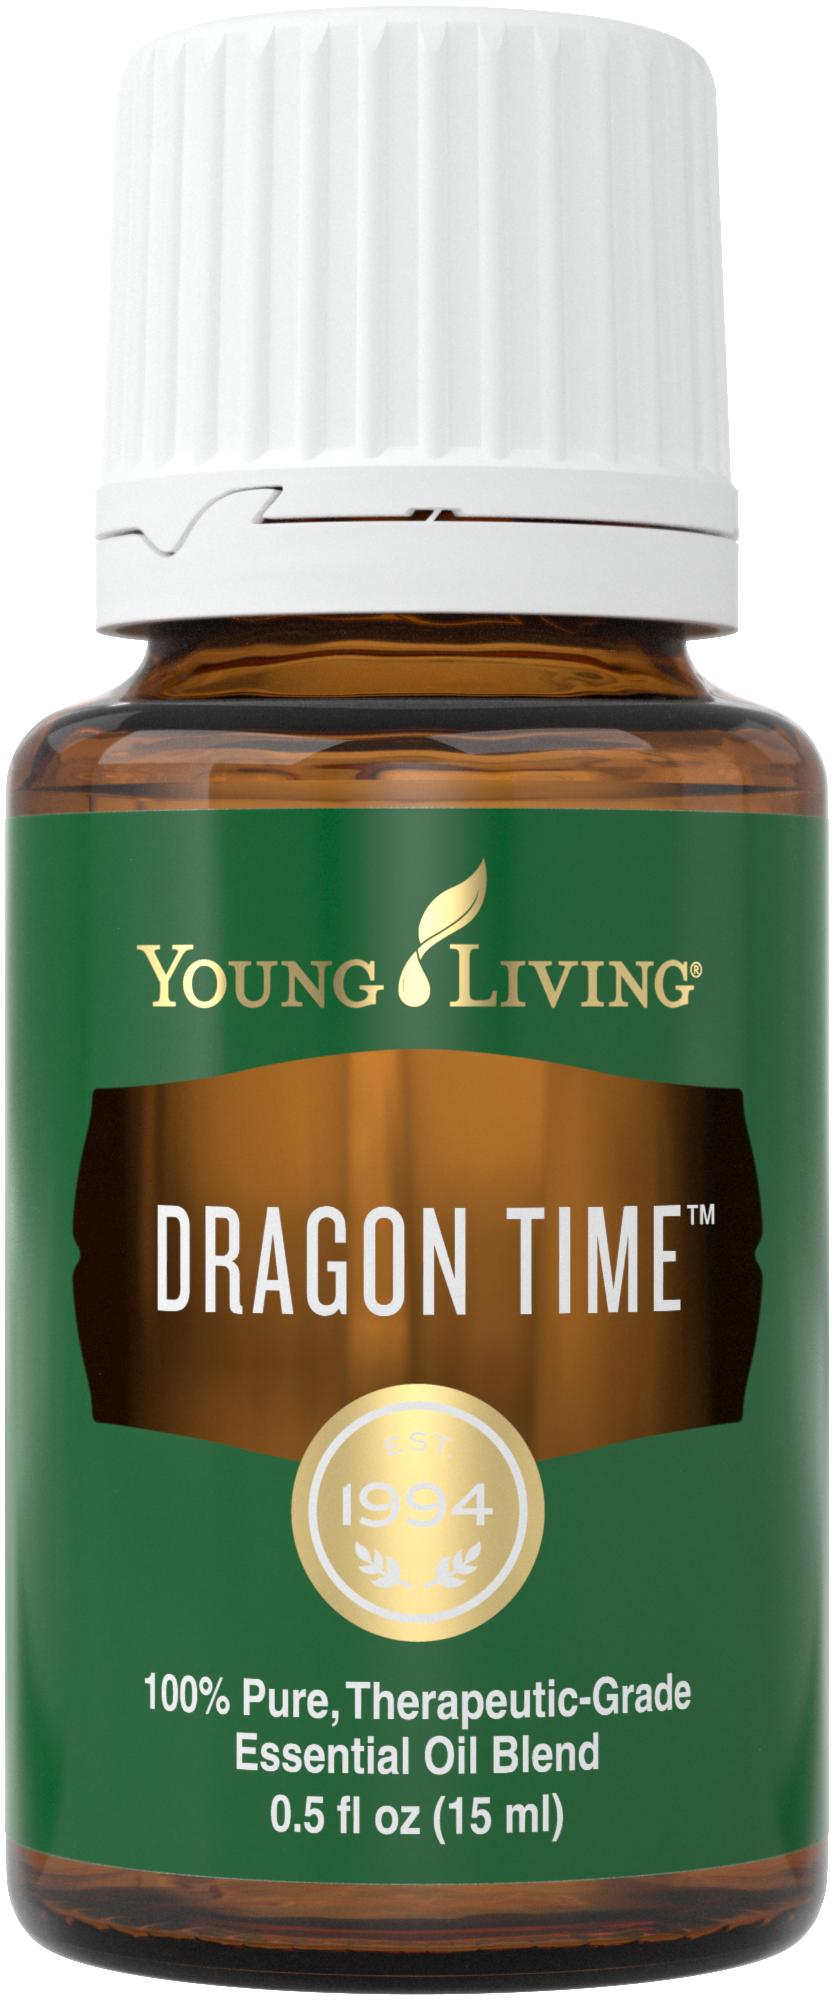 Dragon Time.png